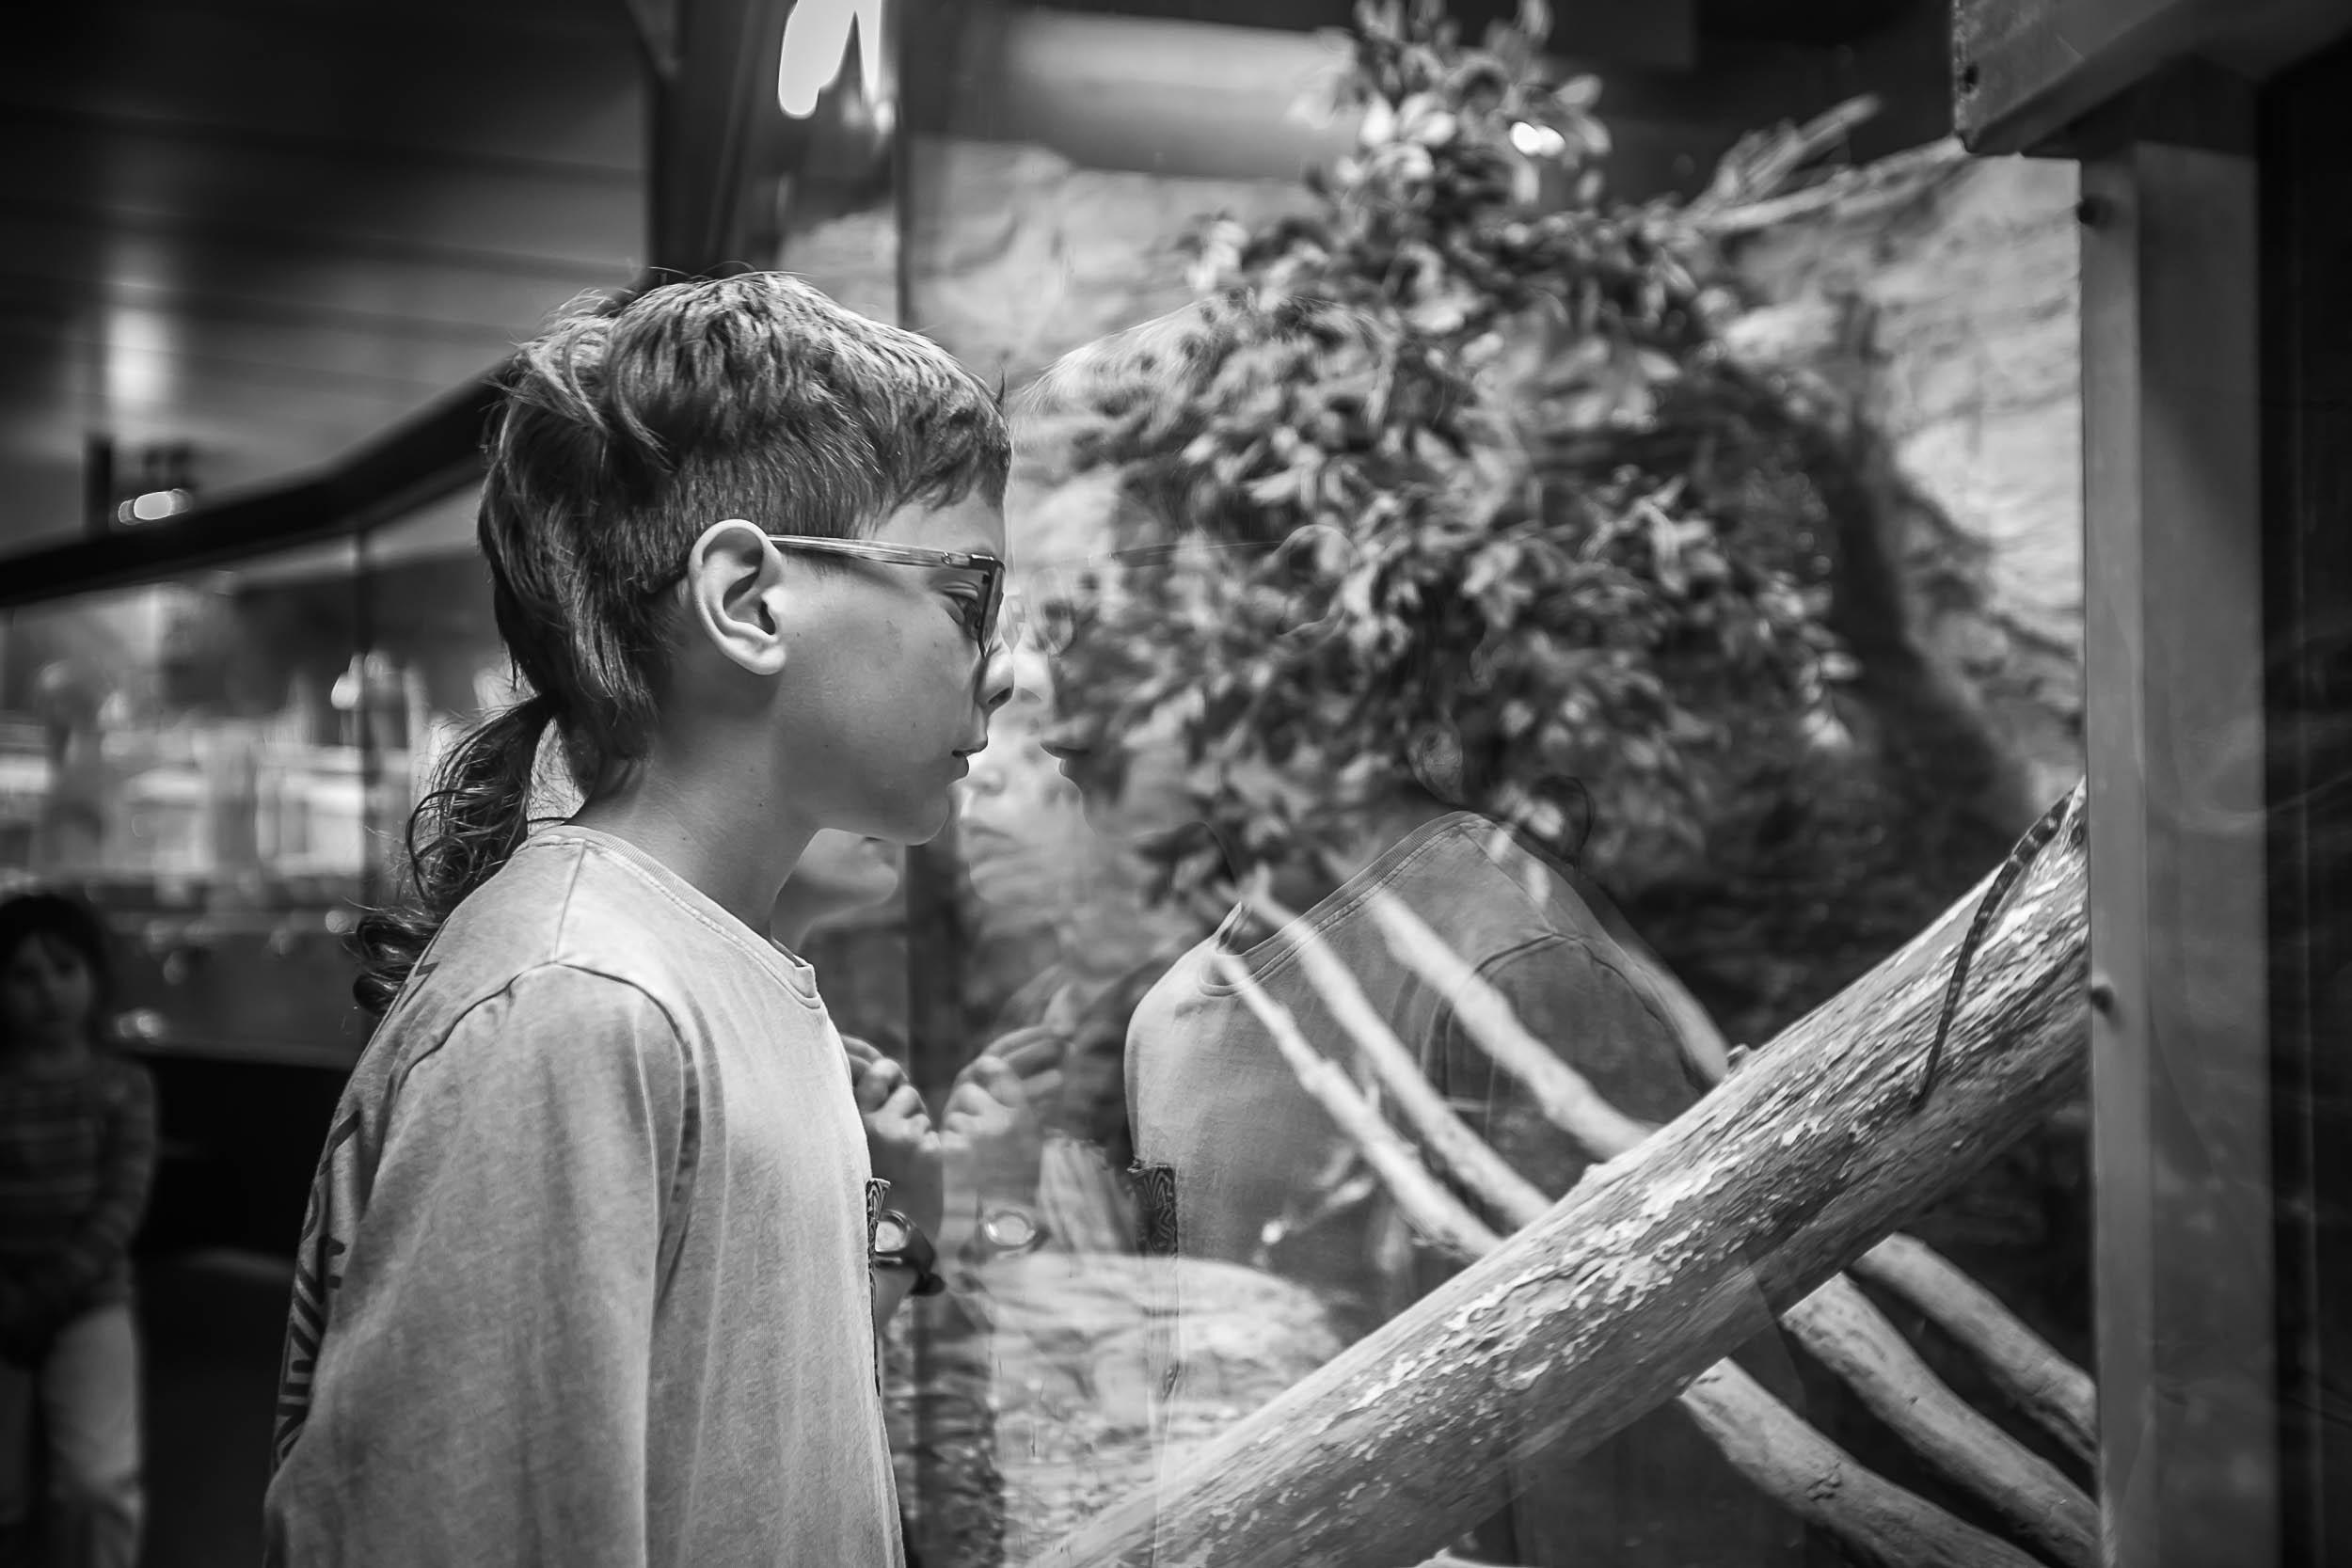 indoor portrait of a child boy